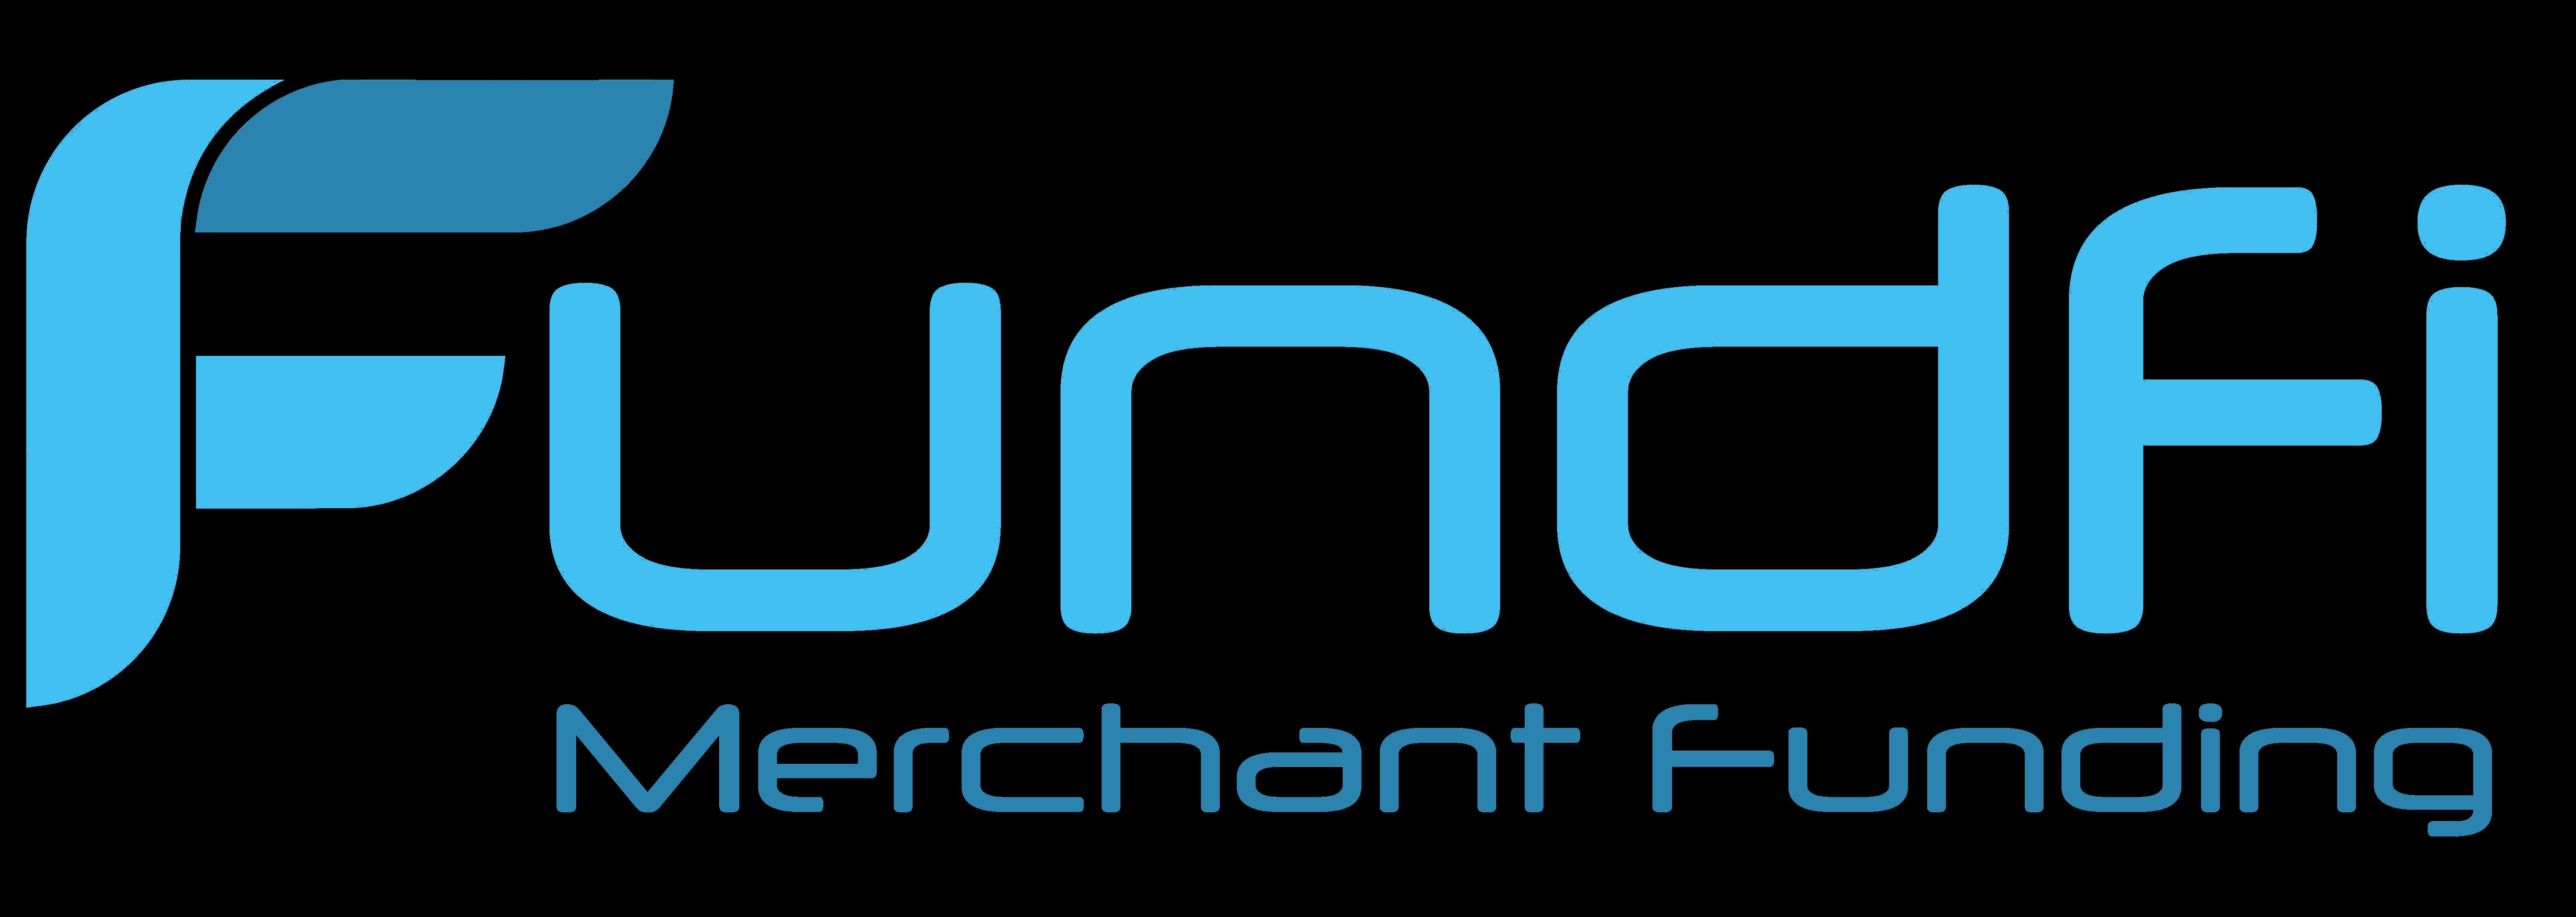 Fundfi Merchant Funding logo